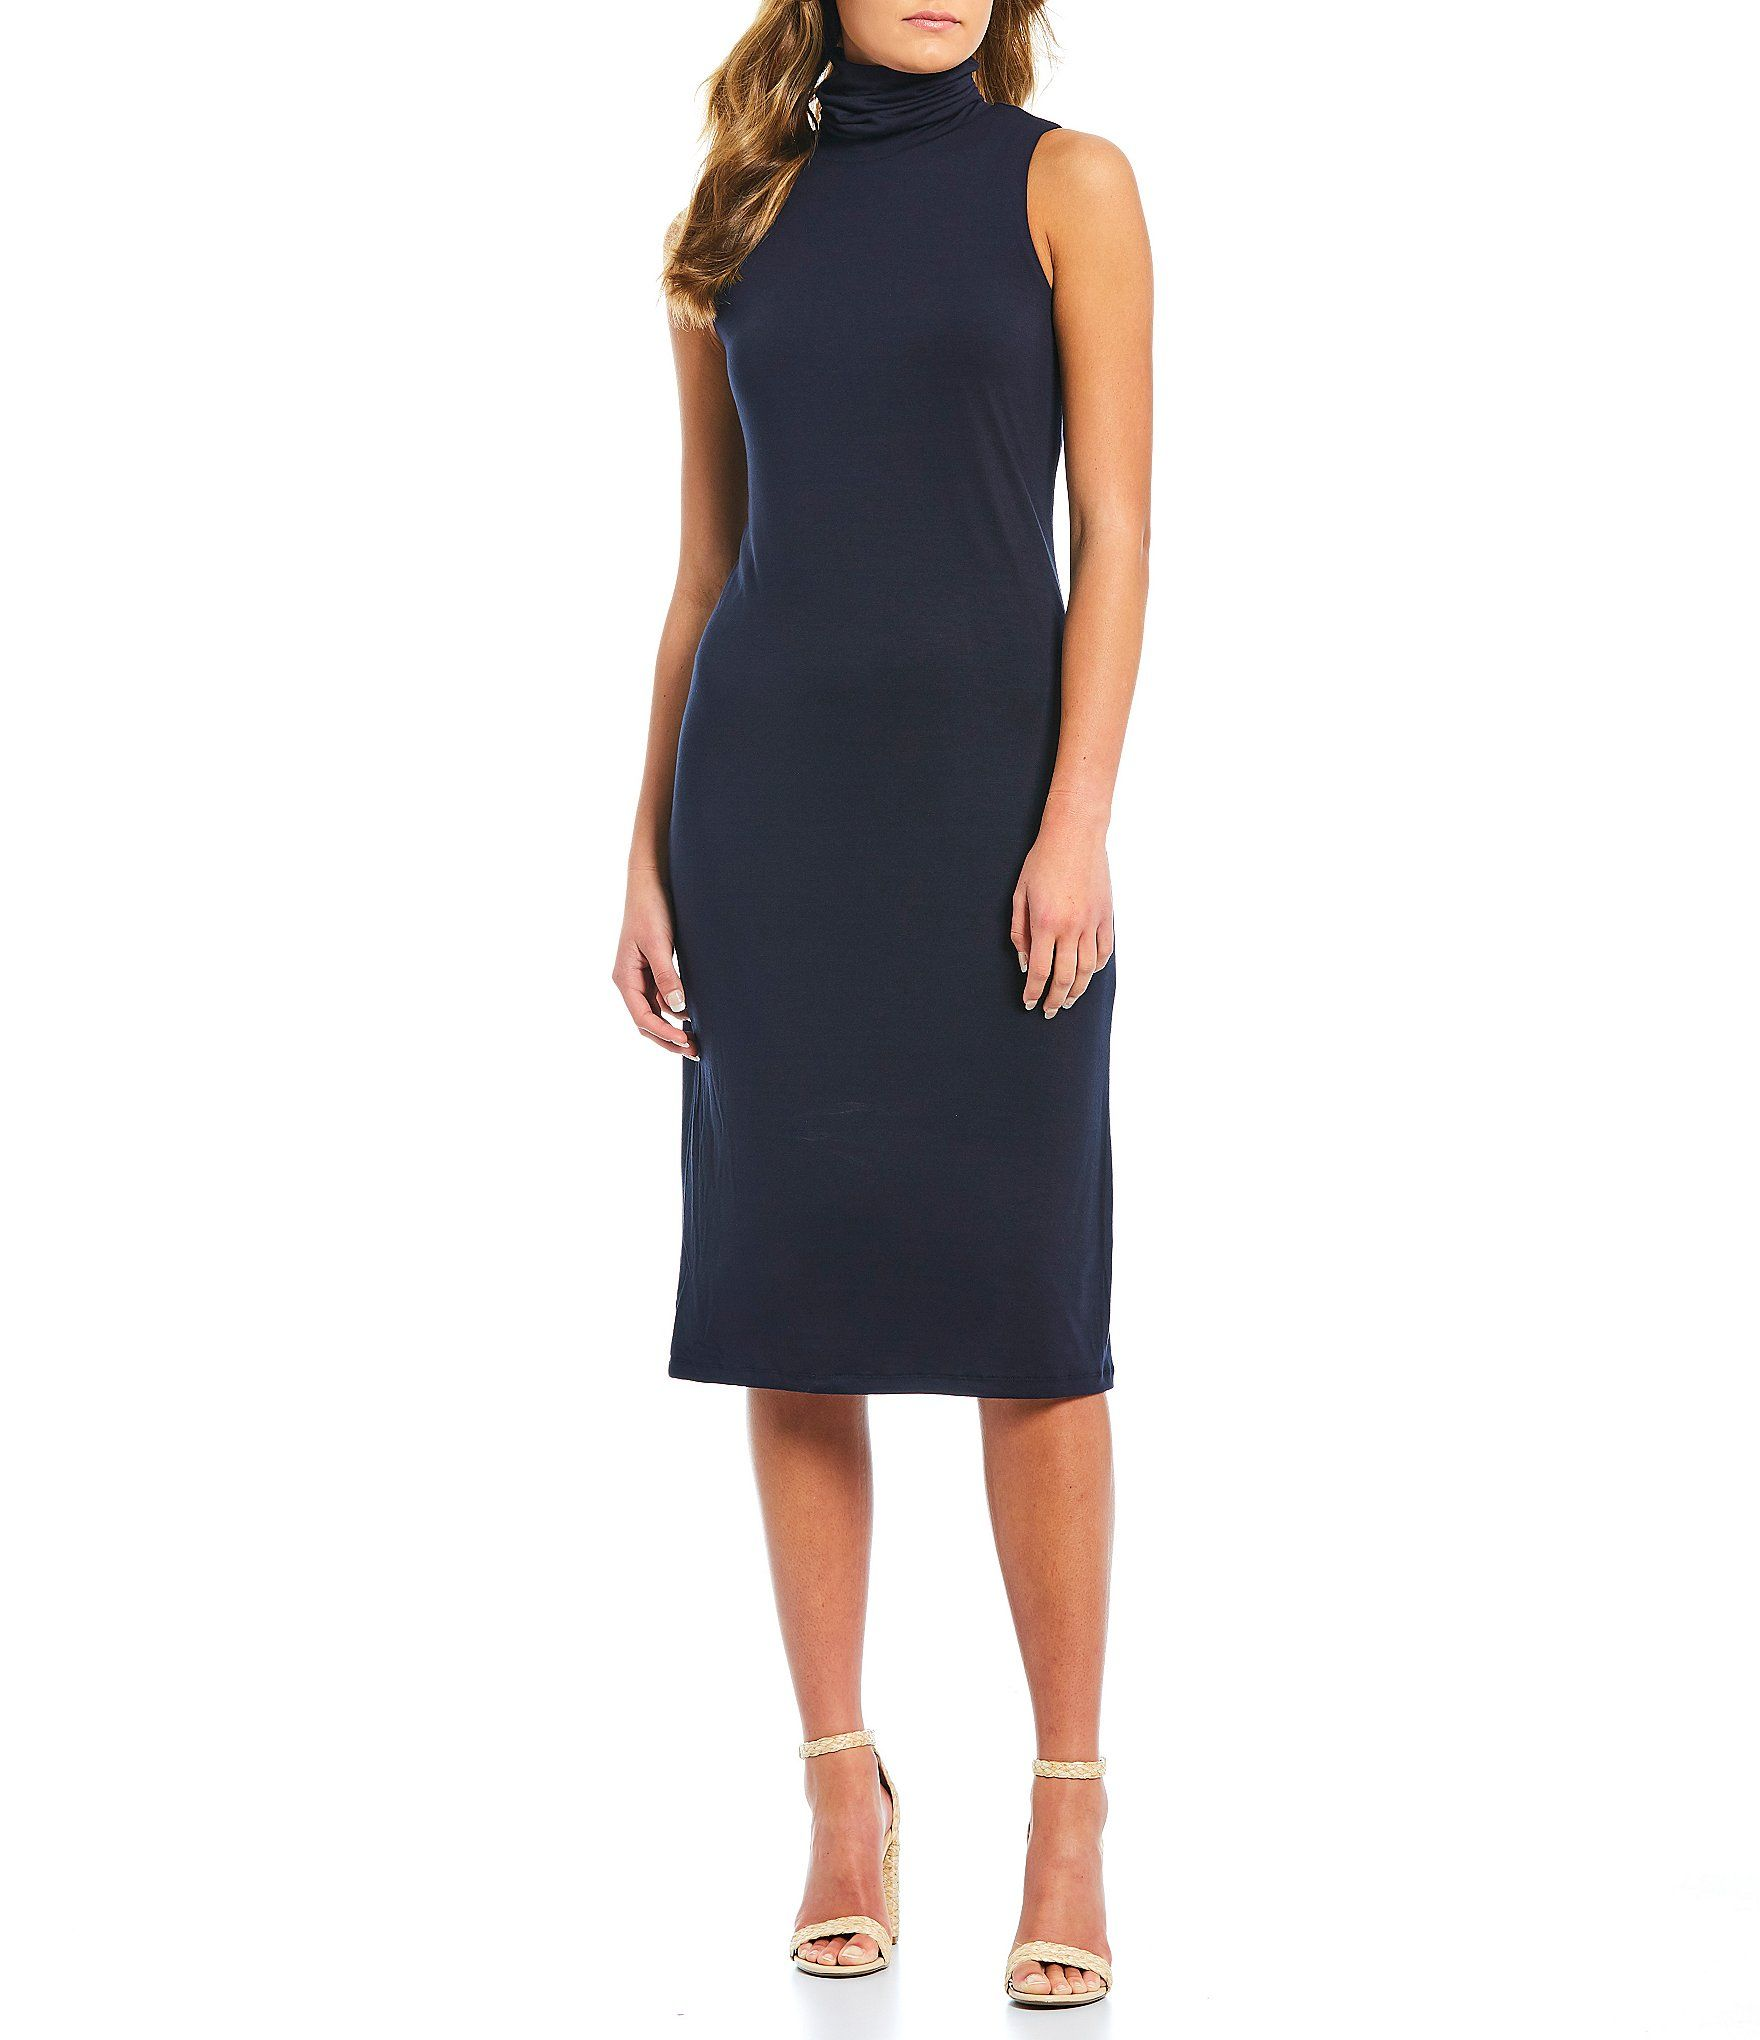 Cremieux Mina Knit Turtleneck Sleeveless Midi Sheath Dress Navy Xs Midi Sheath Dress High Fashion Street Style Fashion [ 2040 x 1760 Pixel ]